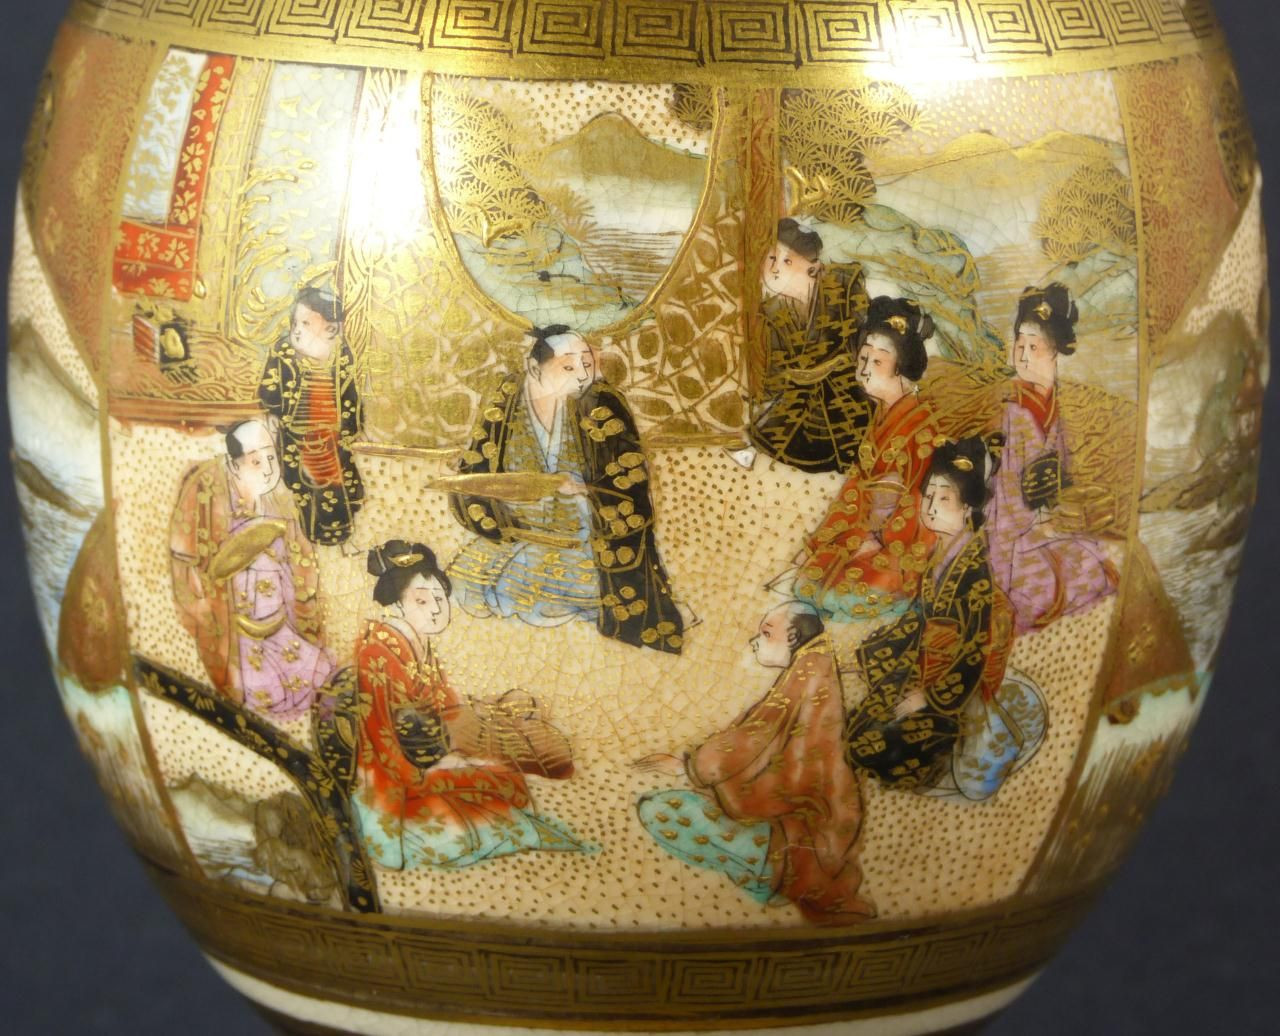 satsuma porcelain vase of detail from hand painted satsuma porcelain vase beautiful satsuma inside detail from hand painted satsuma porcelain vase